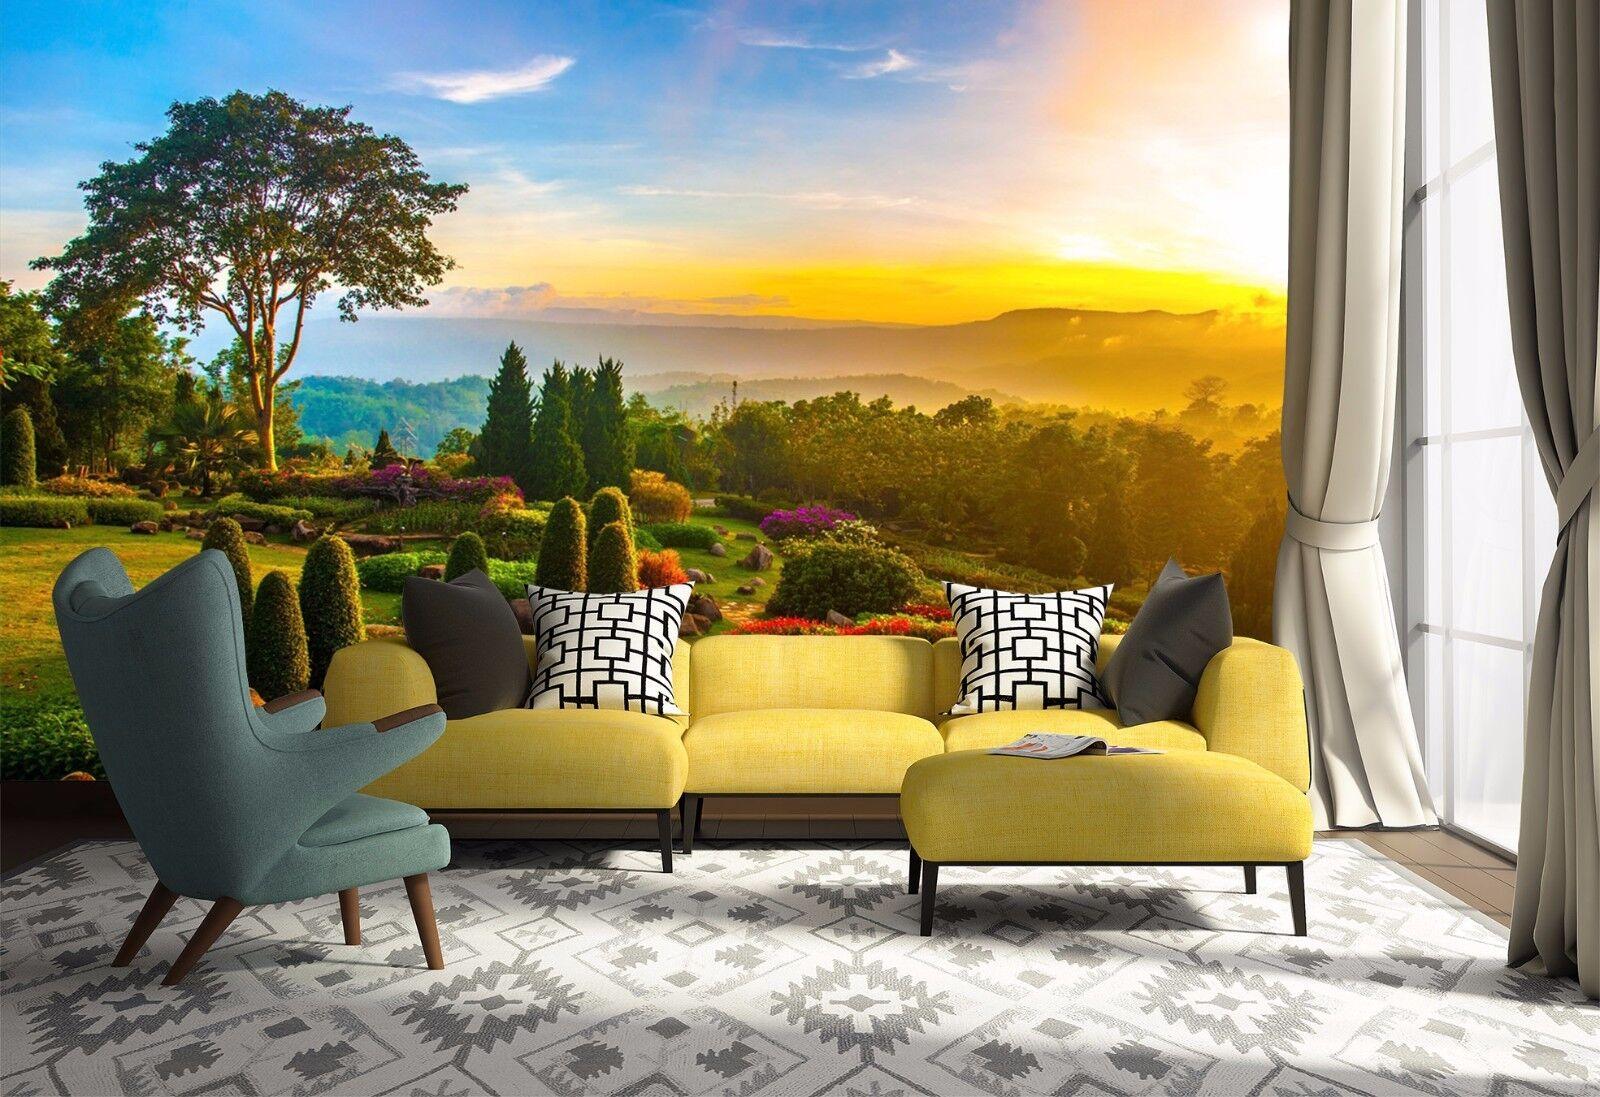 3D Sunshine Woods Sky 802 Wallpaper Mural Paper Wall Print Wallpaper Murals UK